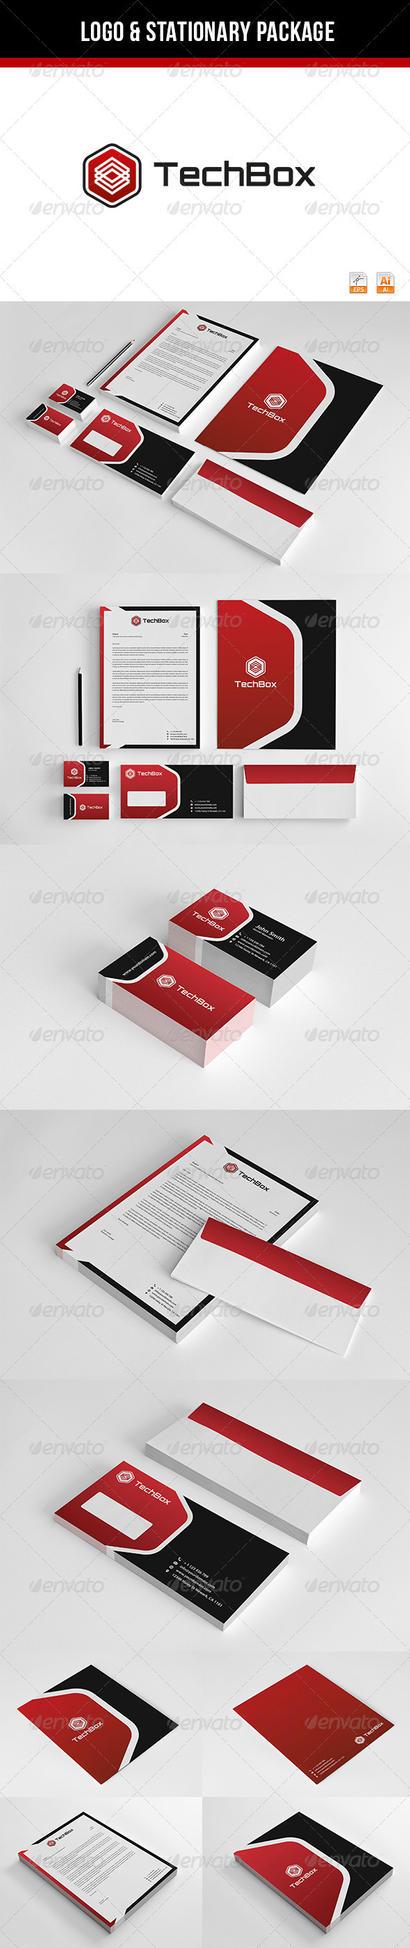 TechBox Corporate Identity by thearslan